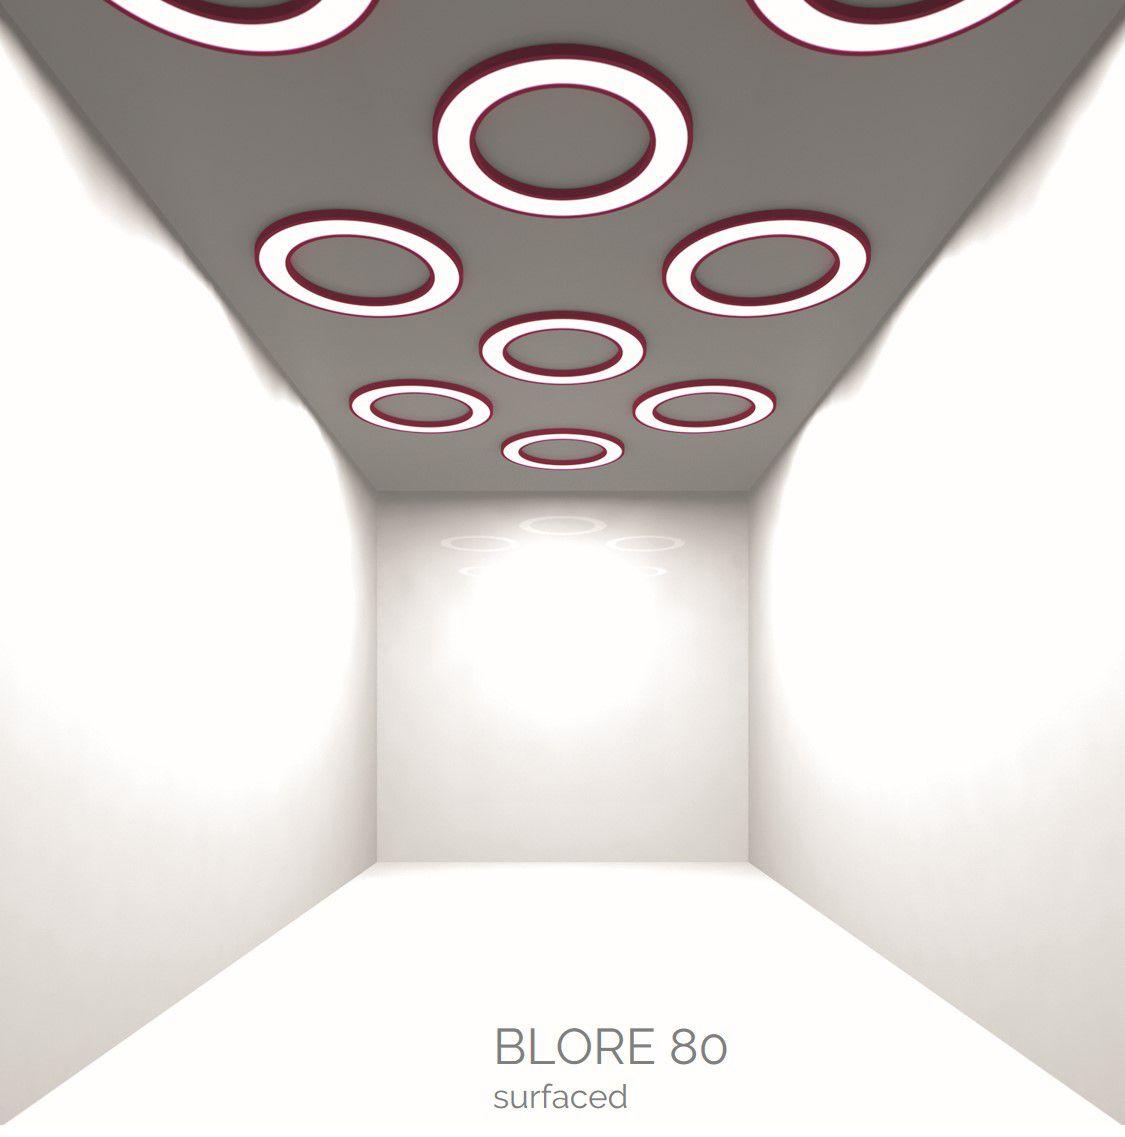 blore 80 opbouw armatuur ring 700x80mm 3000k 2922lm 35w fix